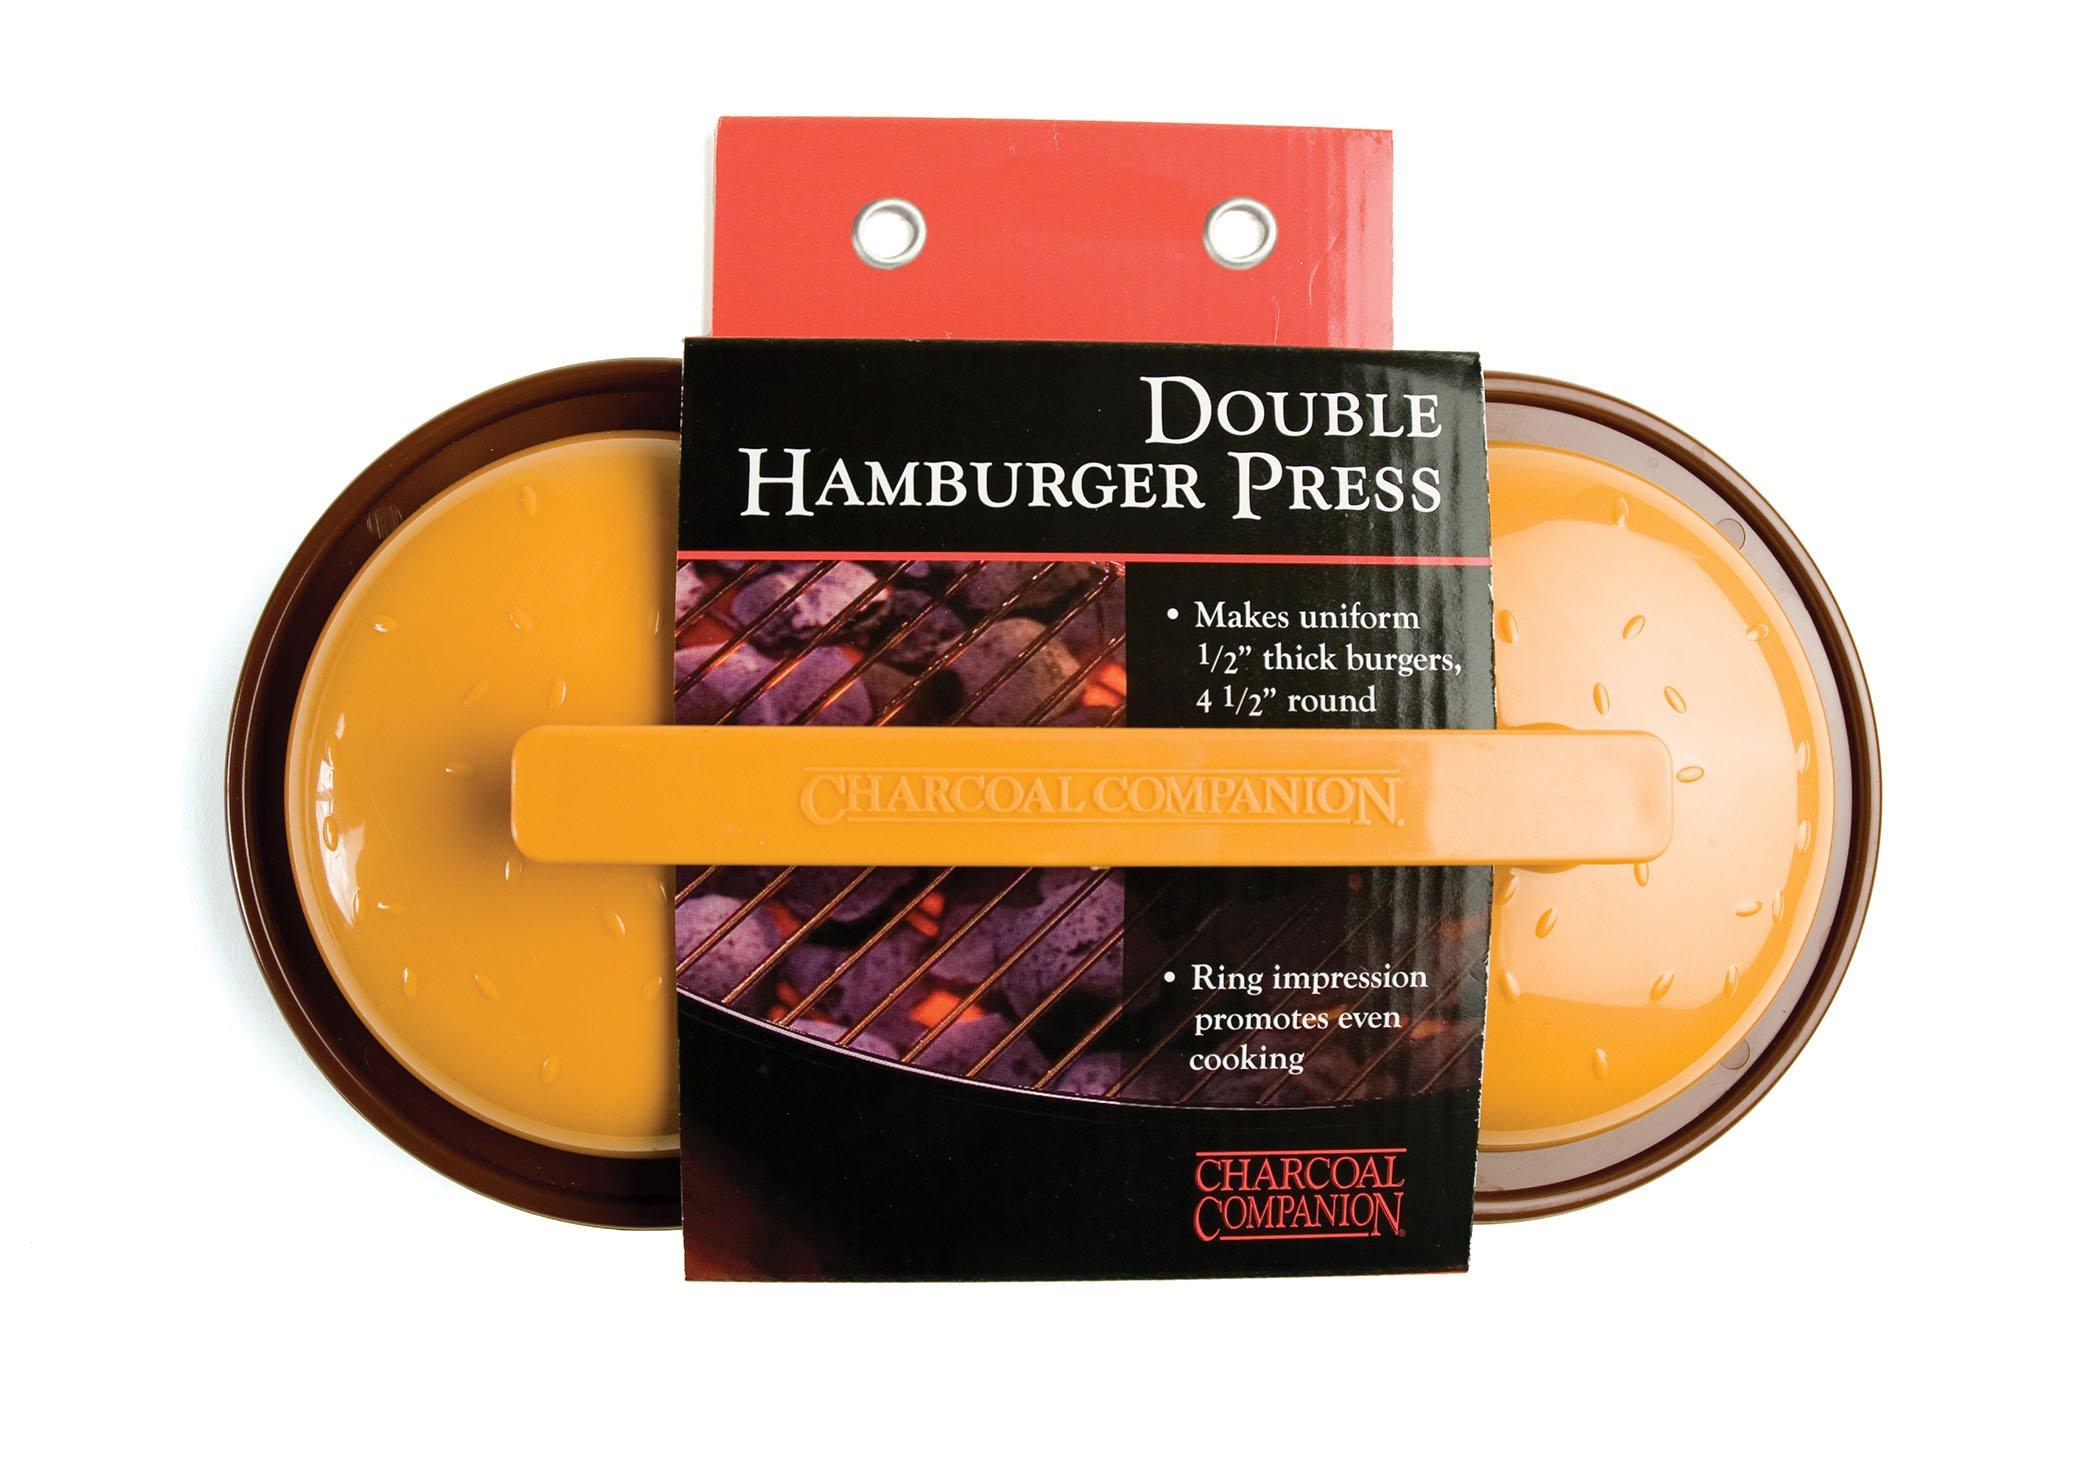 Charcoal Companion Plastic Double Hamburger Grilling Press by Charcoal Companion (Image #3)